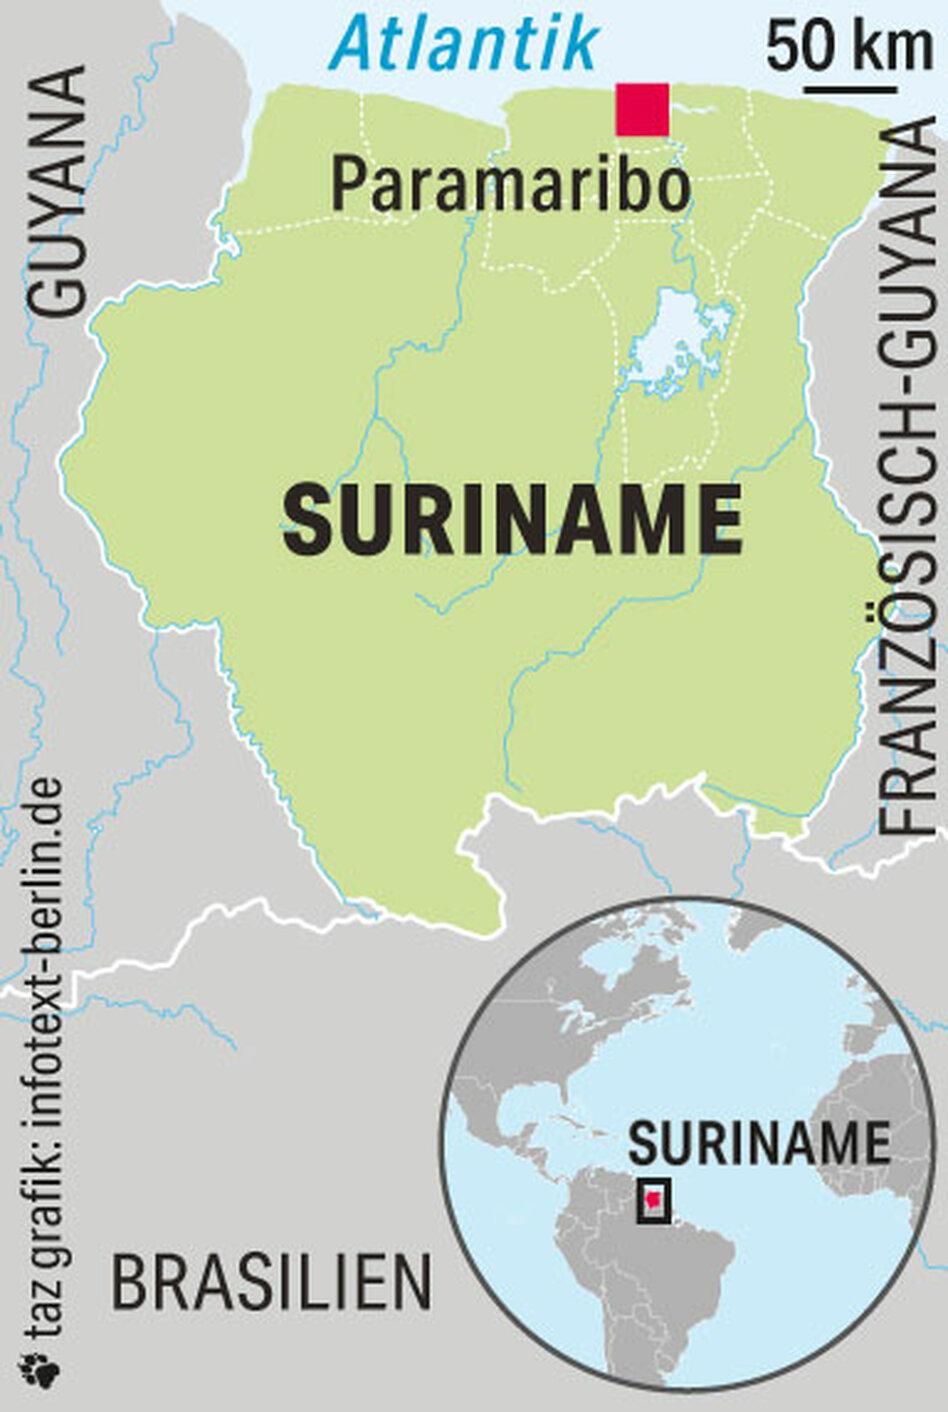 Ende Der Ara Bouterse In Surinam Surinam Hofft Auf Veranderung Taz De